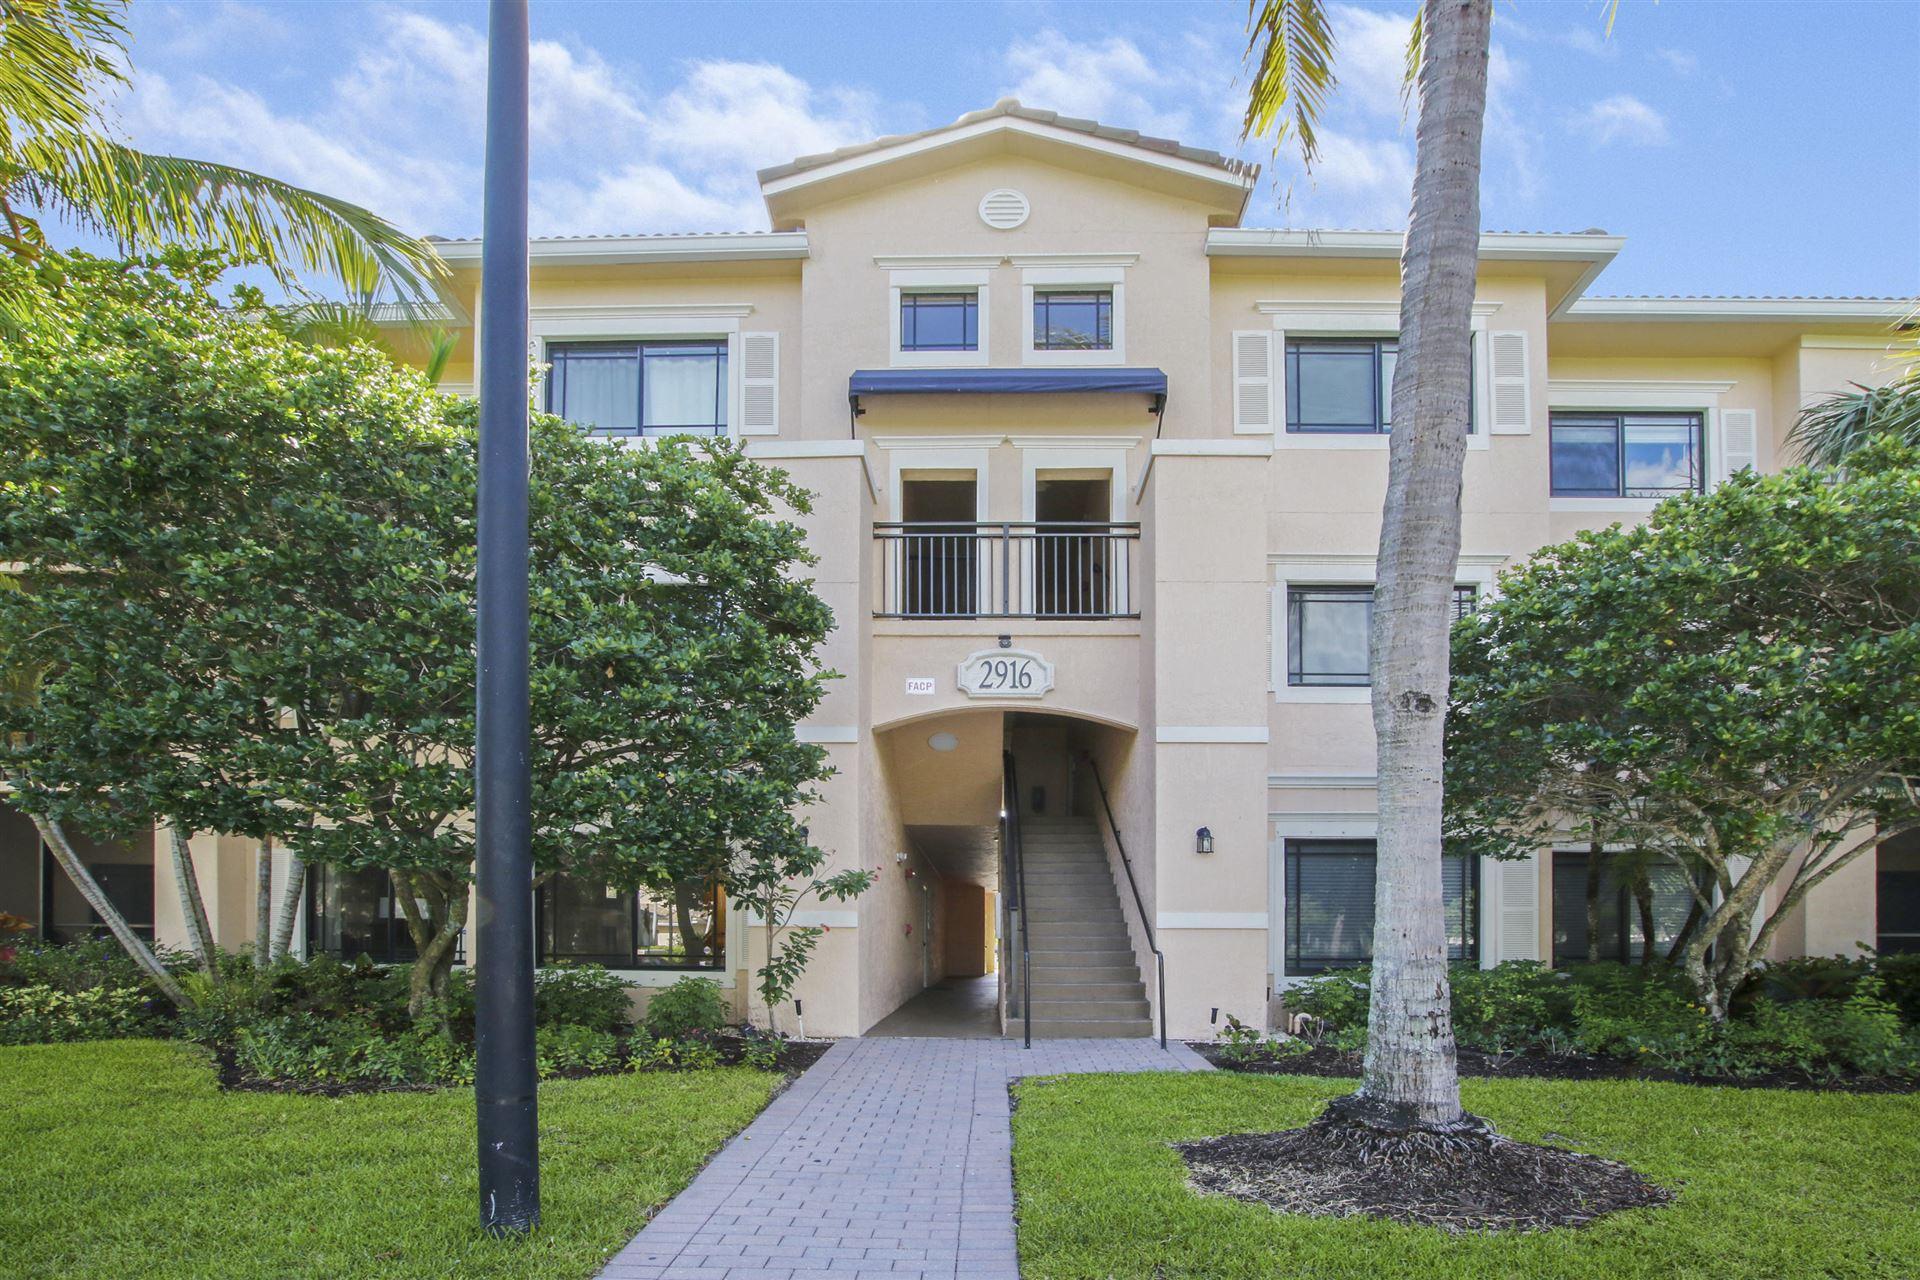 2916 Tuscany Court #105, Palm Beach Gardens, FL 33410 - MLS#: RX-10723111